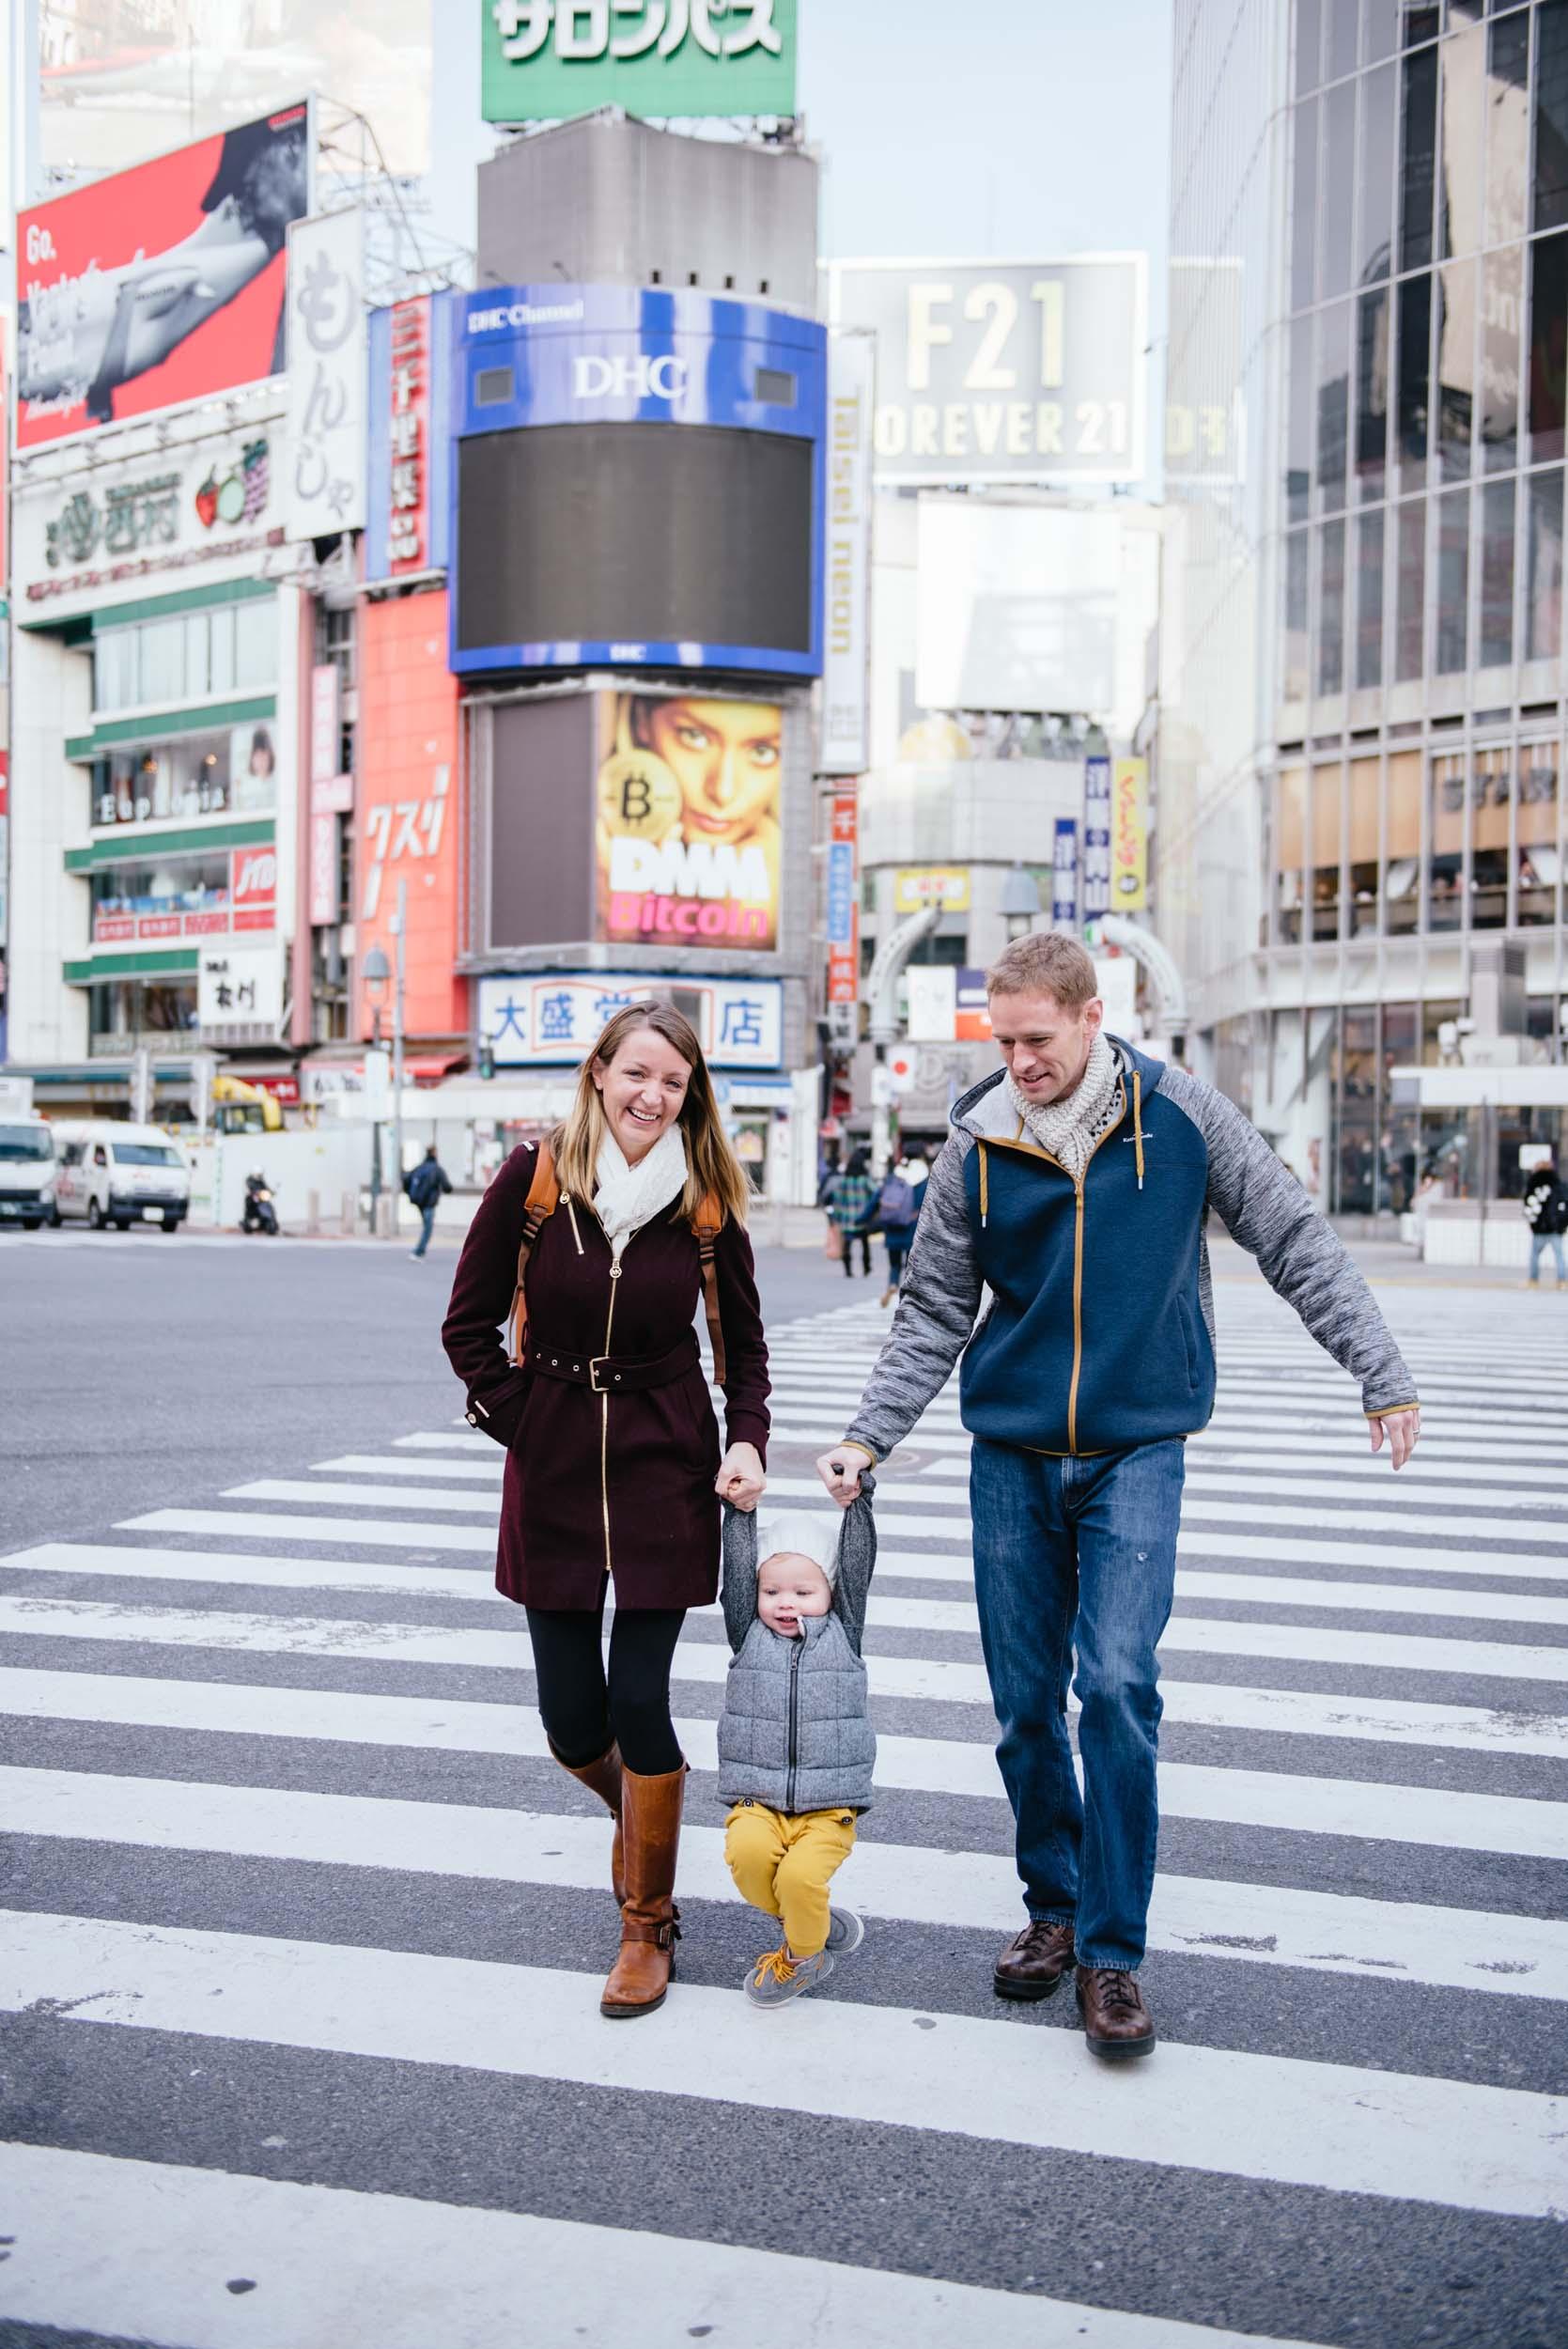 Flytographer Daniel in Tokyo